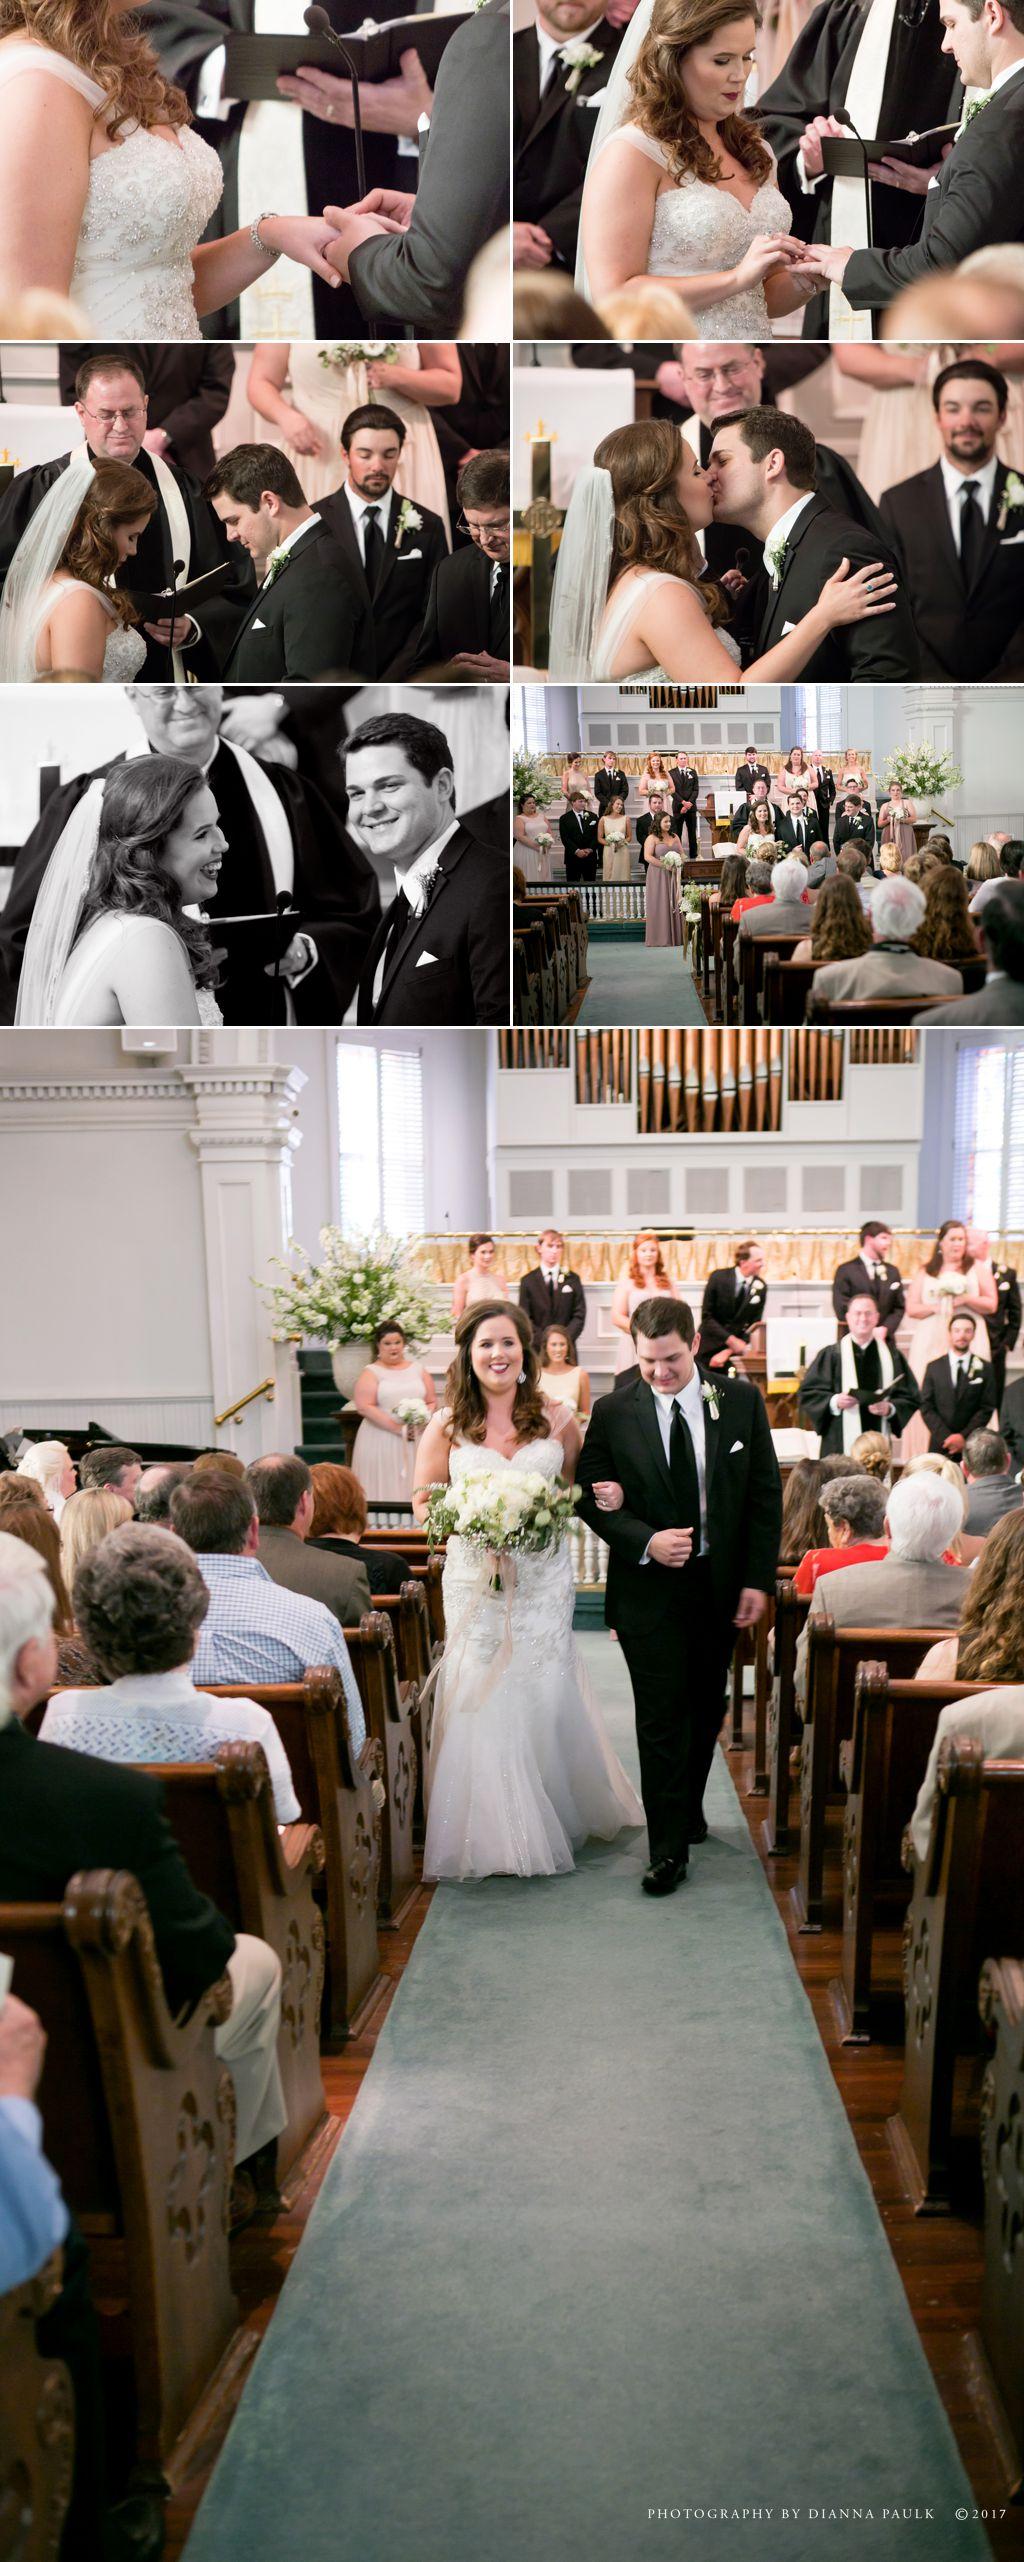 Wedding At First United Methodist Church Of Troy Al Photography By Dianna Paulk A